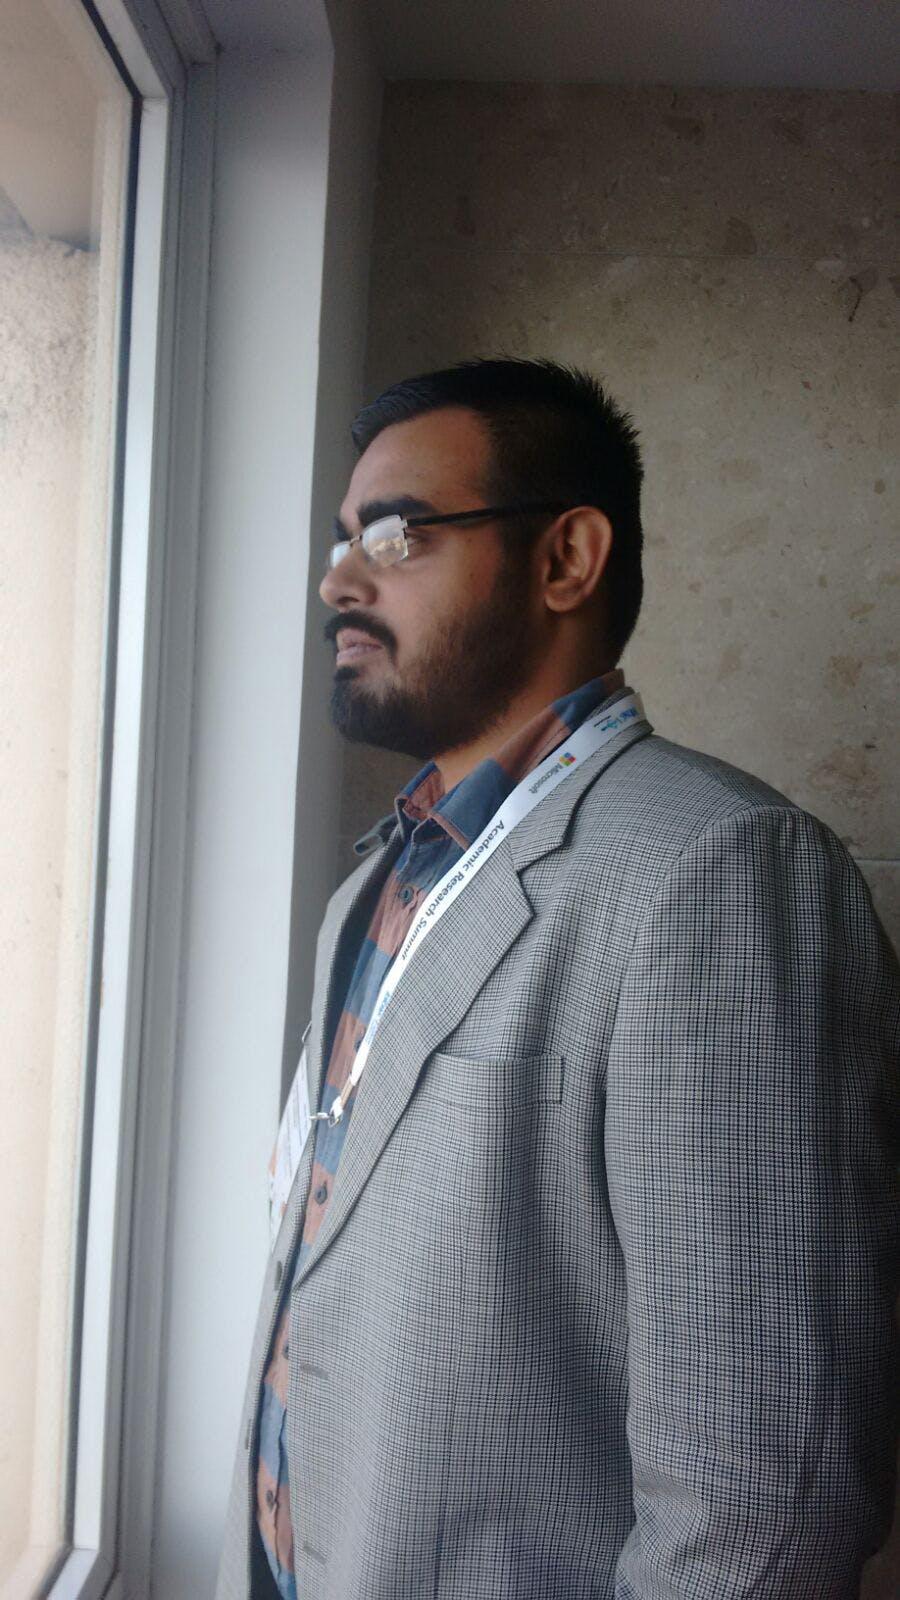 Anandarup Mukherjee